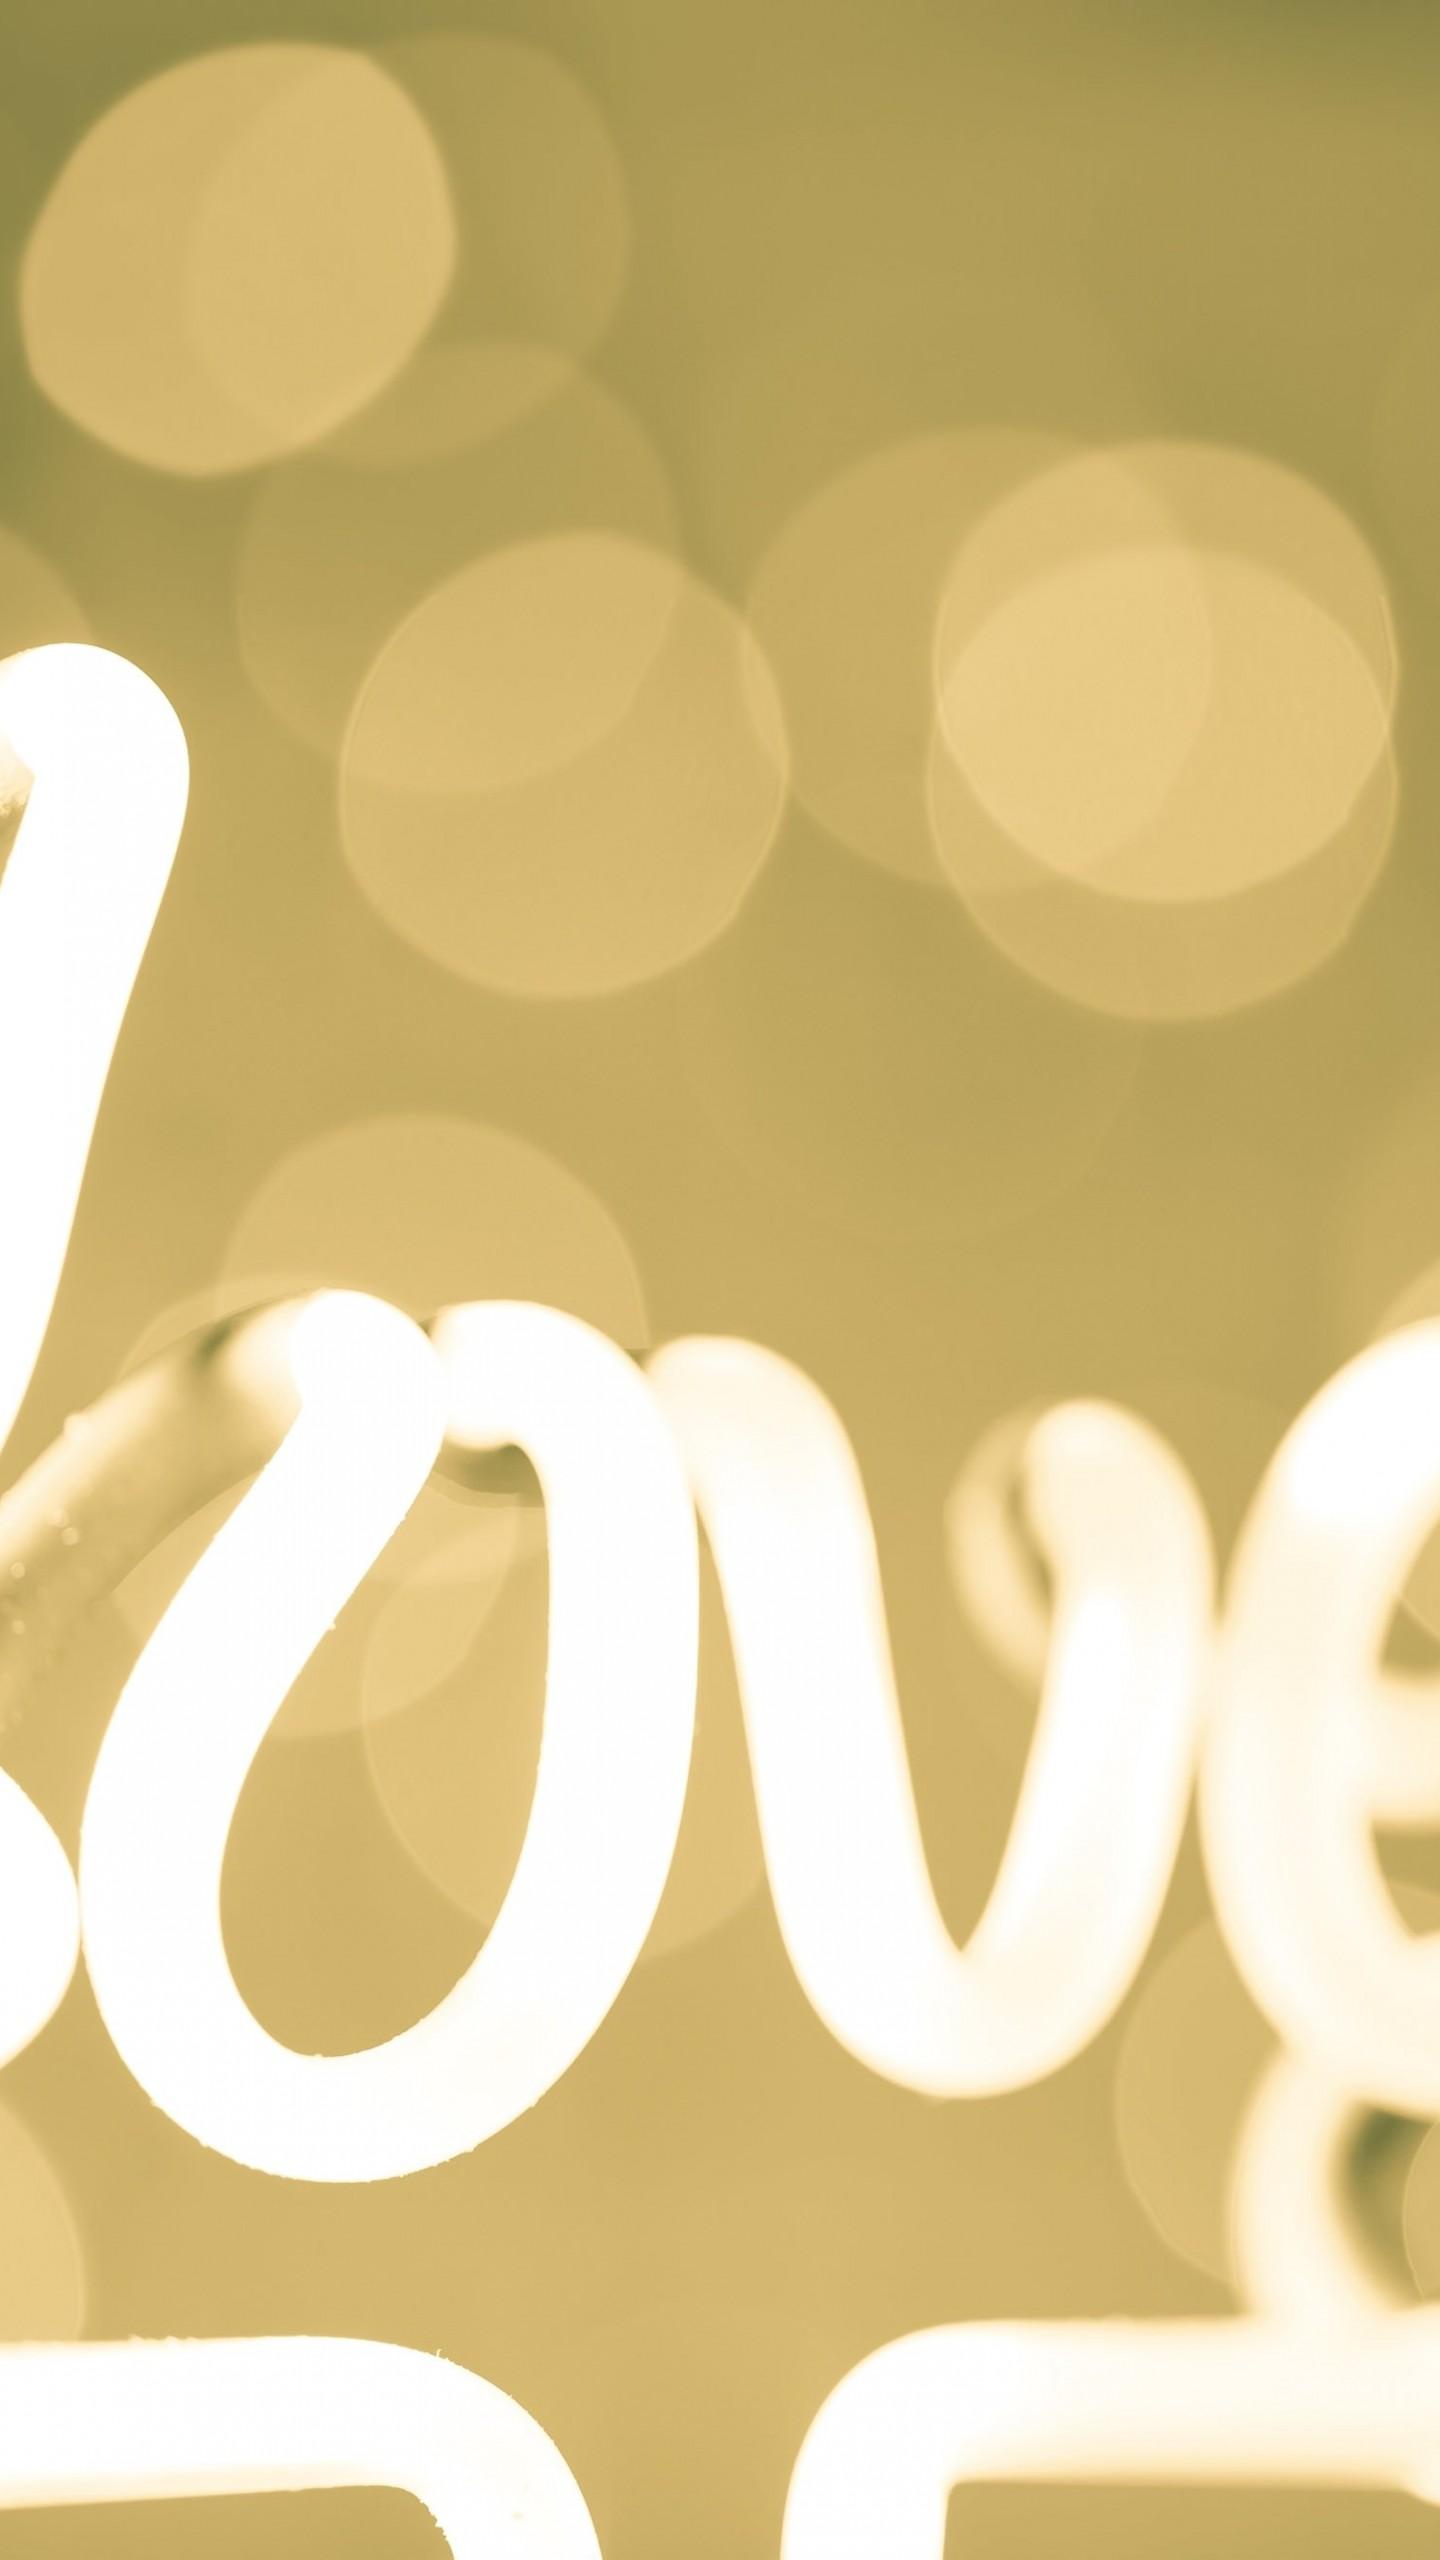 Hd wallpaper download love - Love Neon Light Typography Hd Wallpaper For Nexus 6